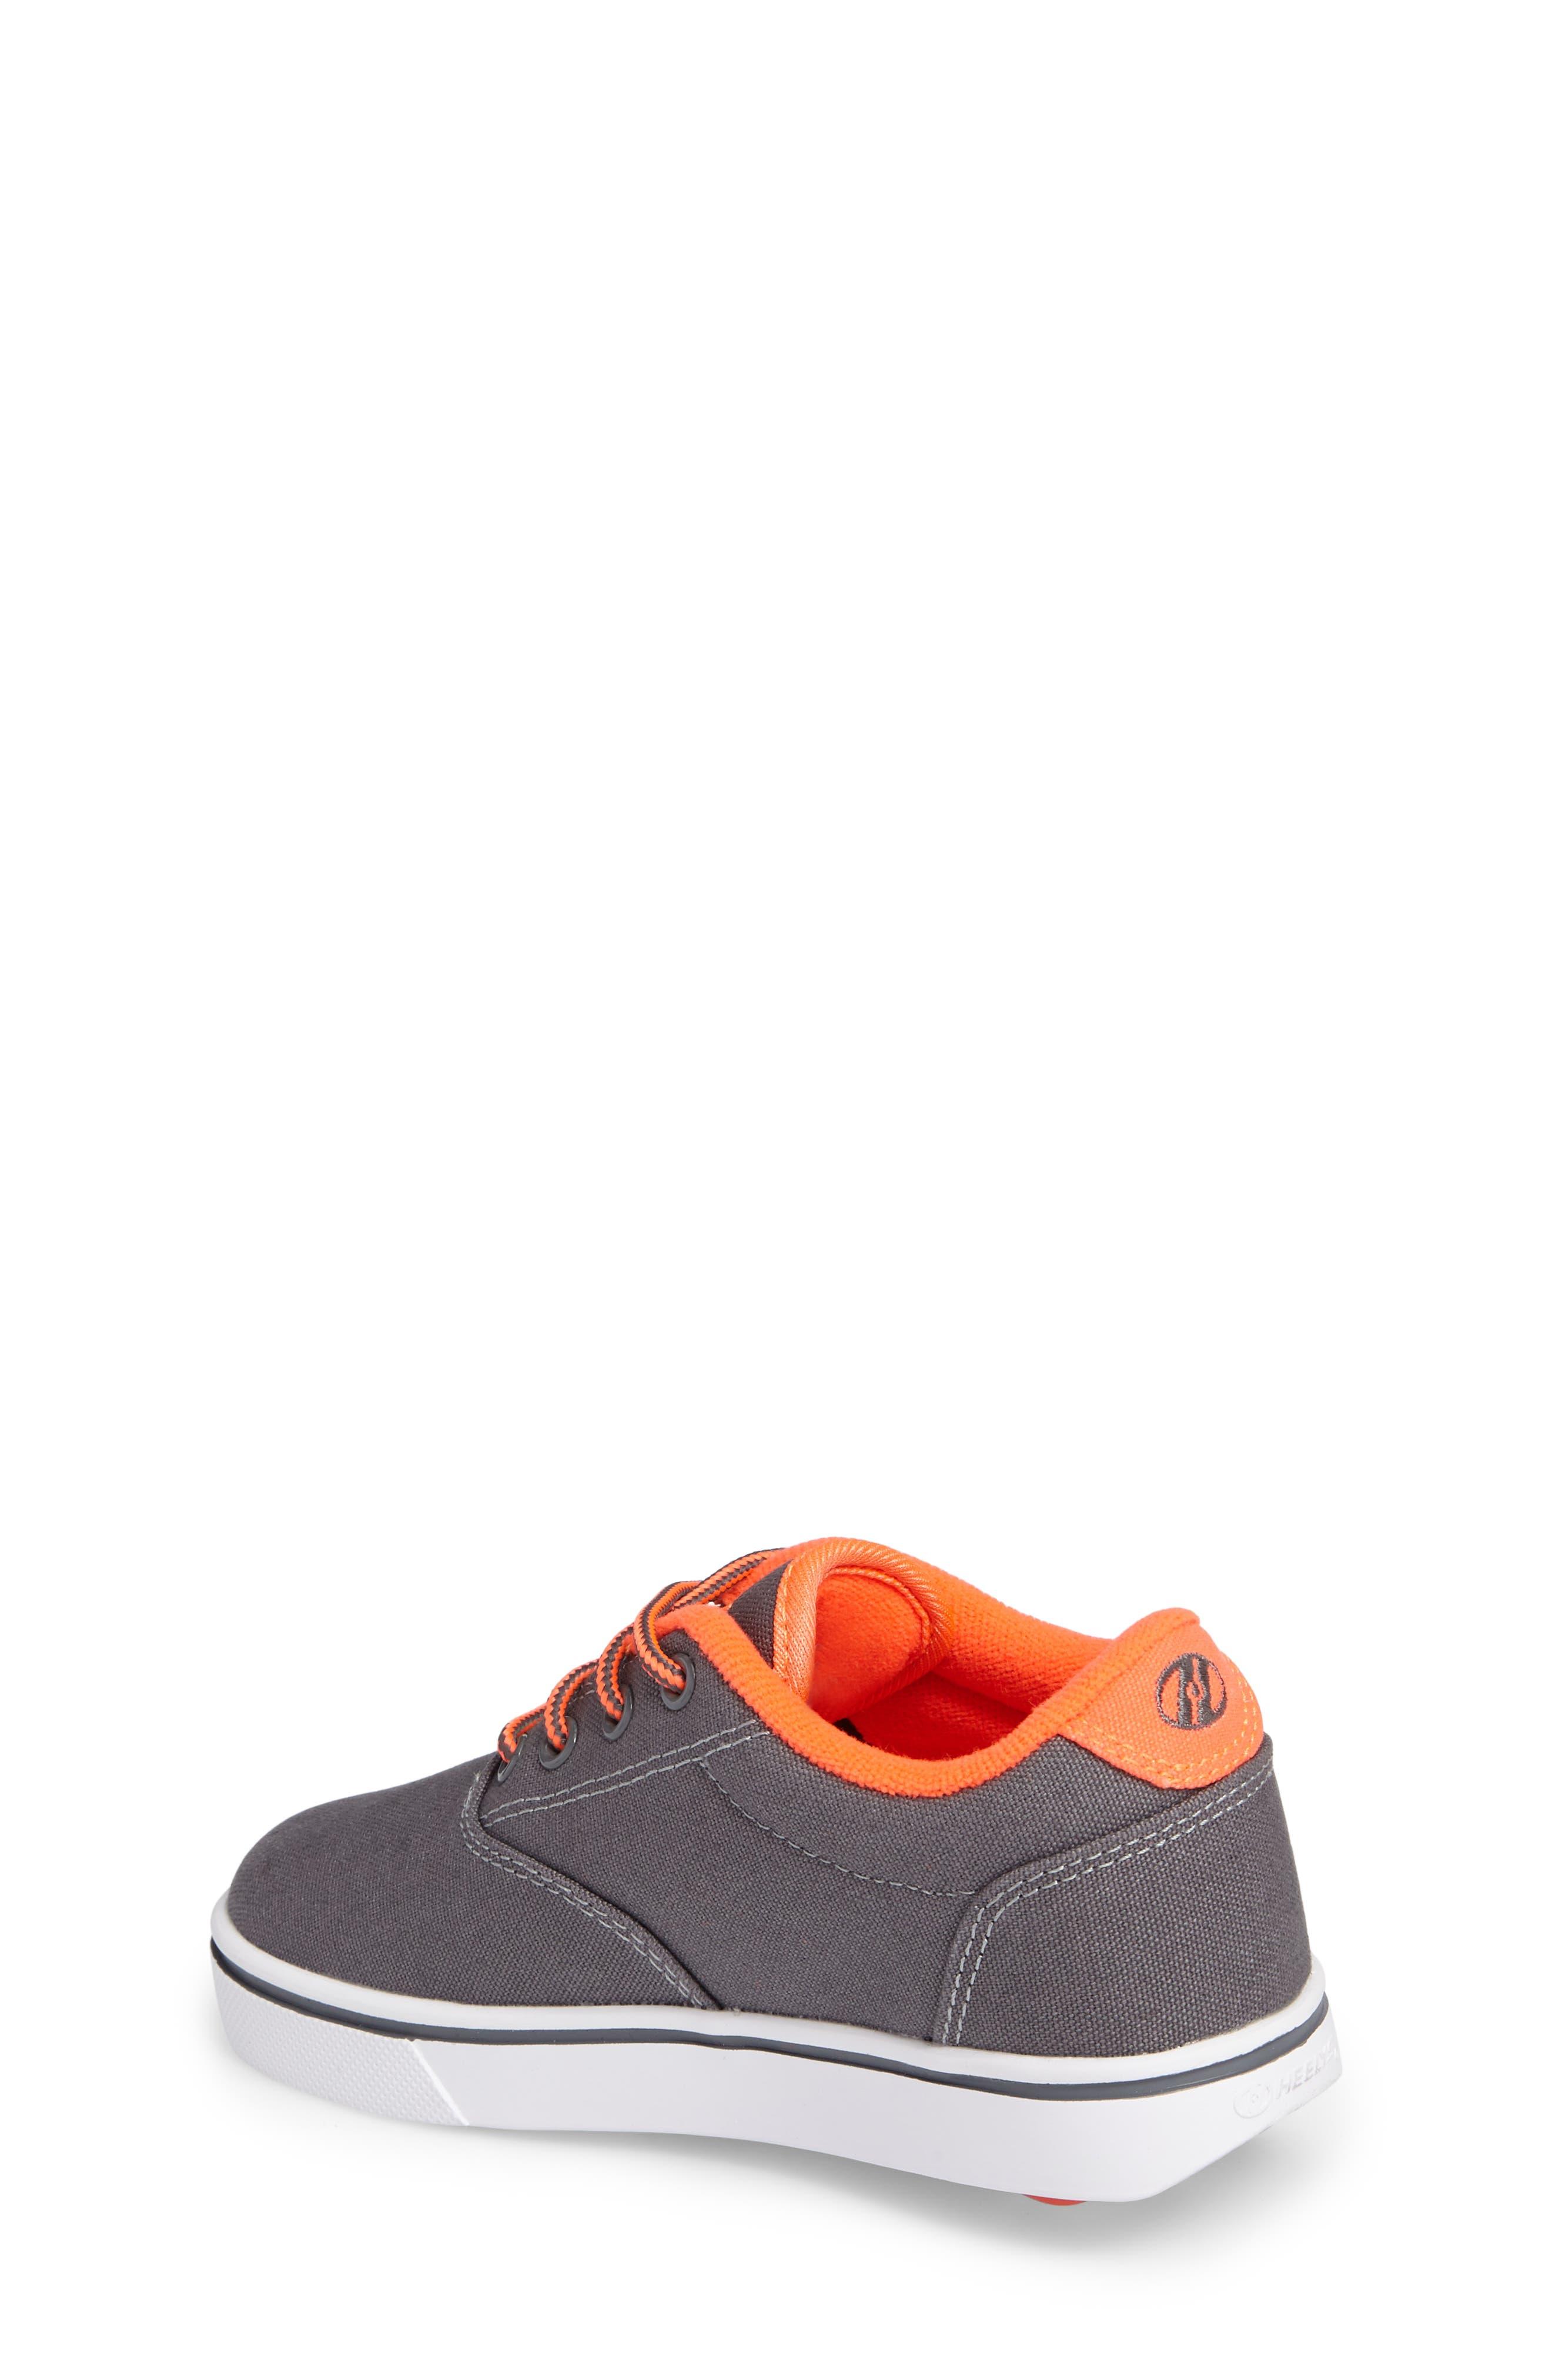 Alternate Image 2  - Heelys 'Launch' Skate Sneaker (Little Kid & Big Kid)